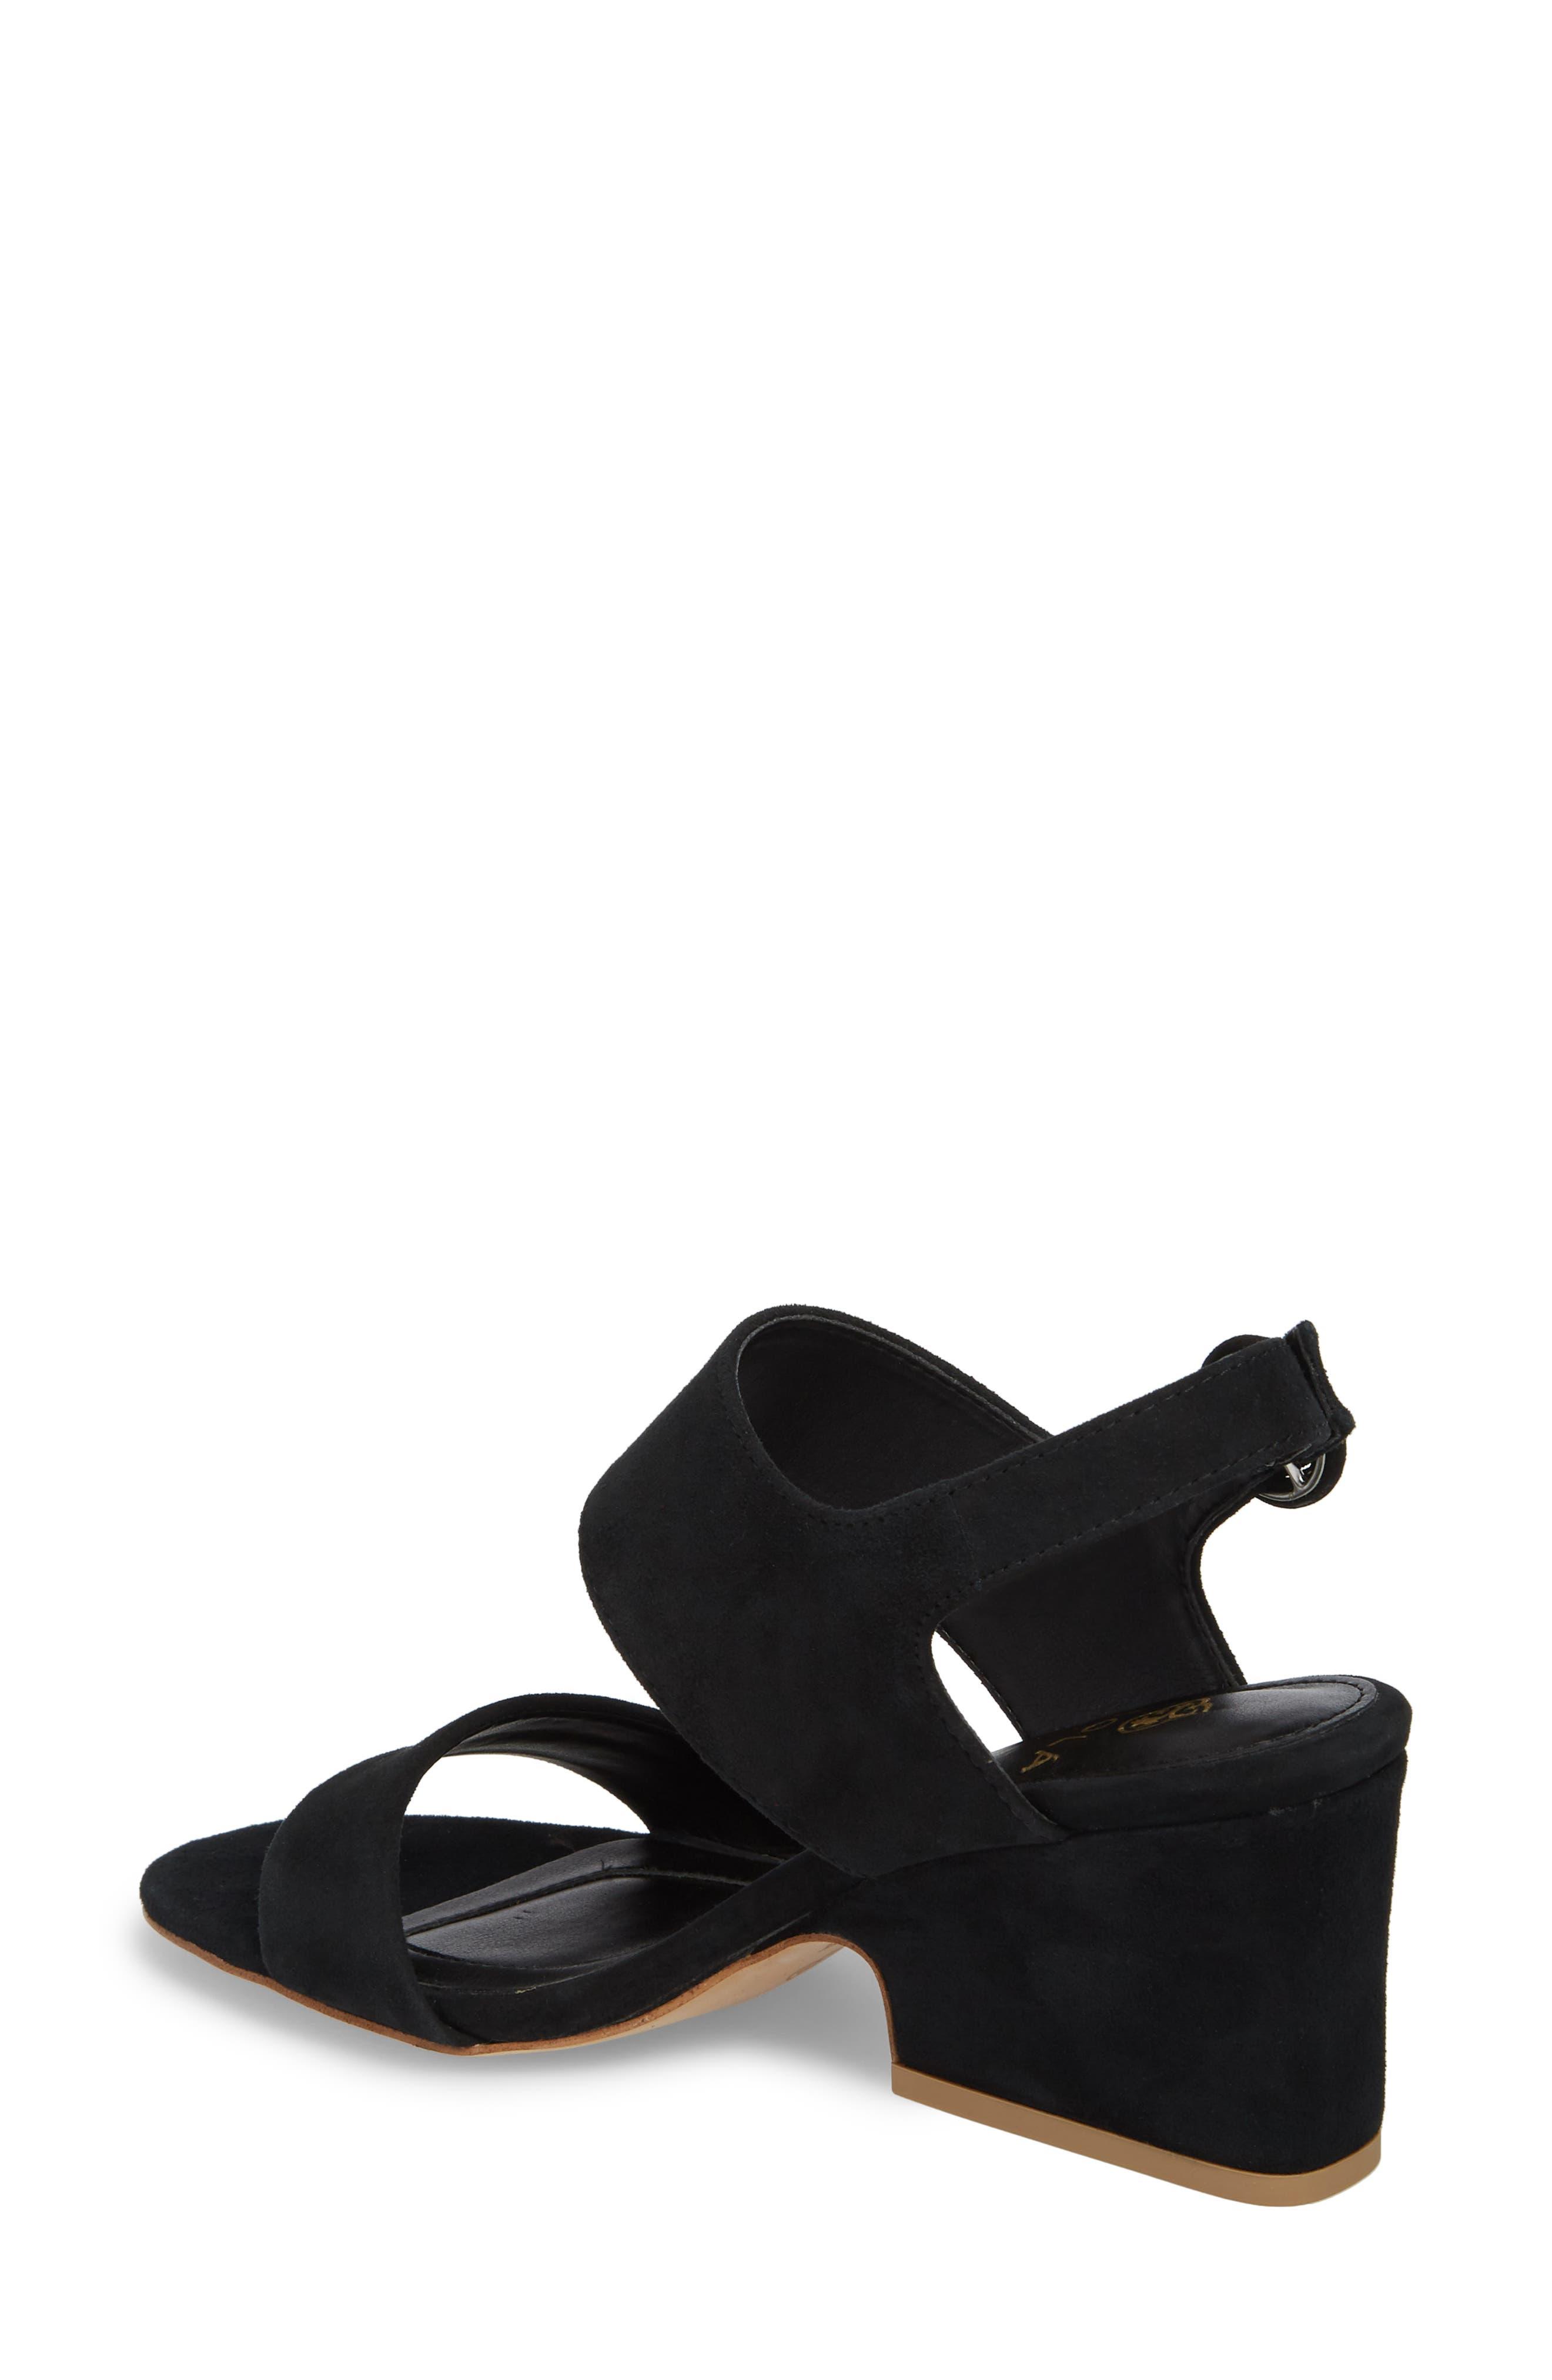 ISOLÁ, Isola Landra Block Heel Sandal, Alternate thumbnail 2, color, BLACK SUEDE